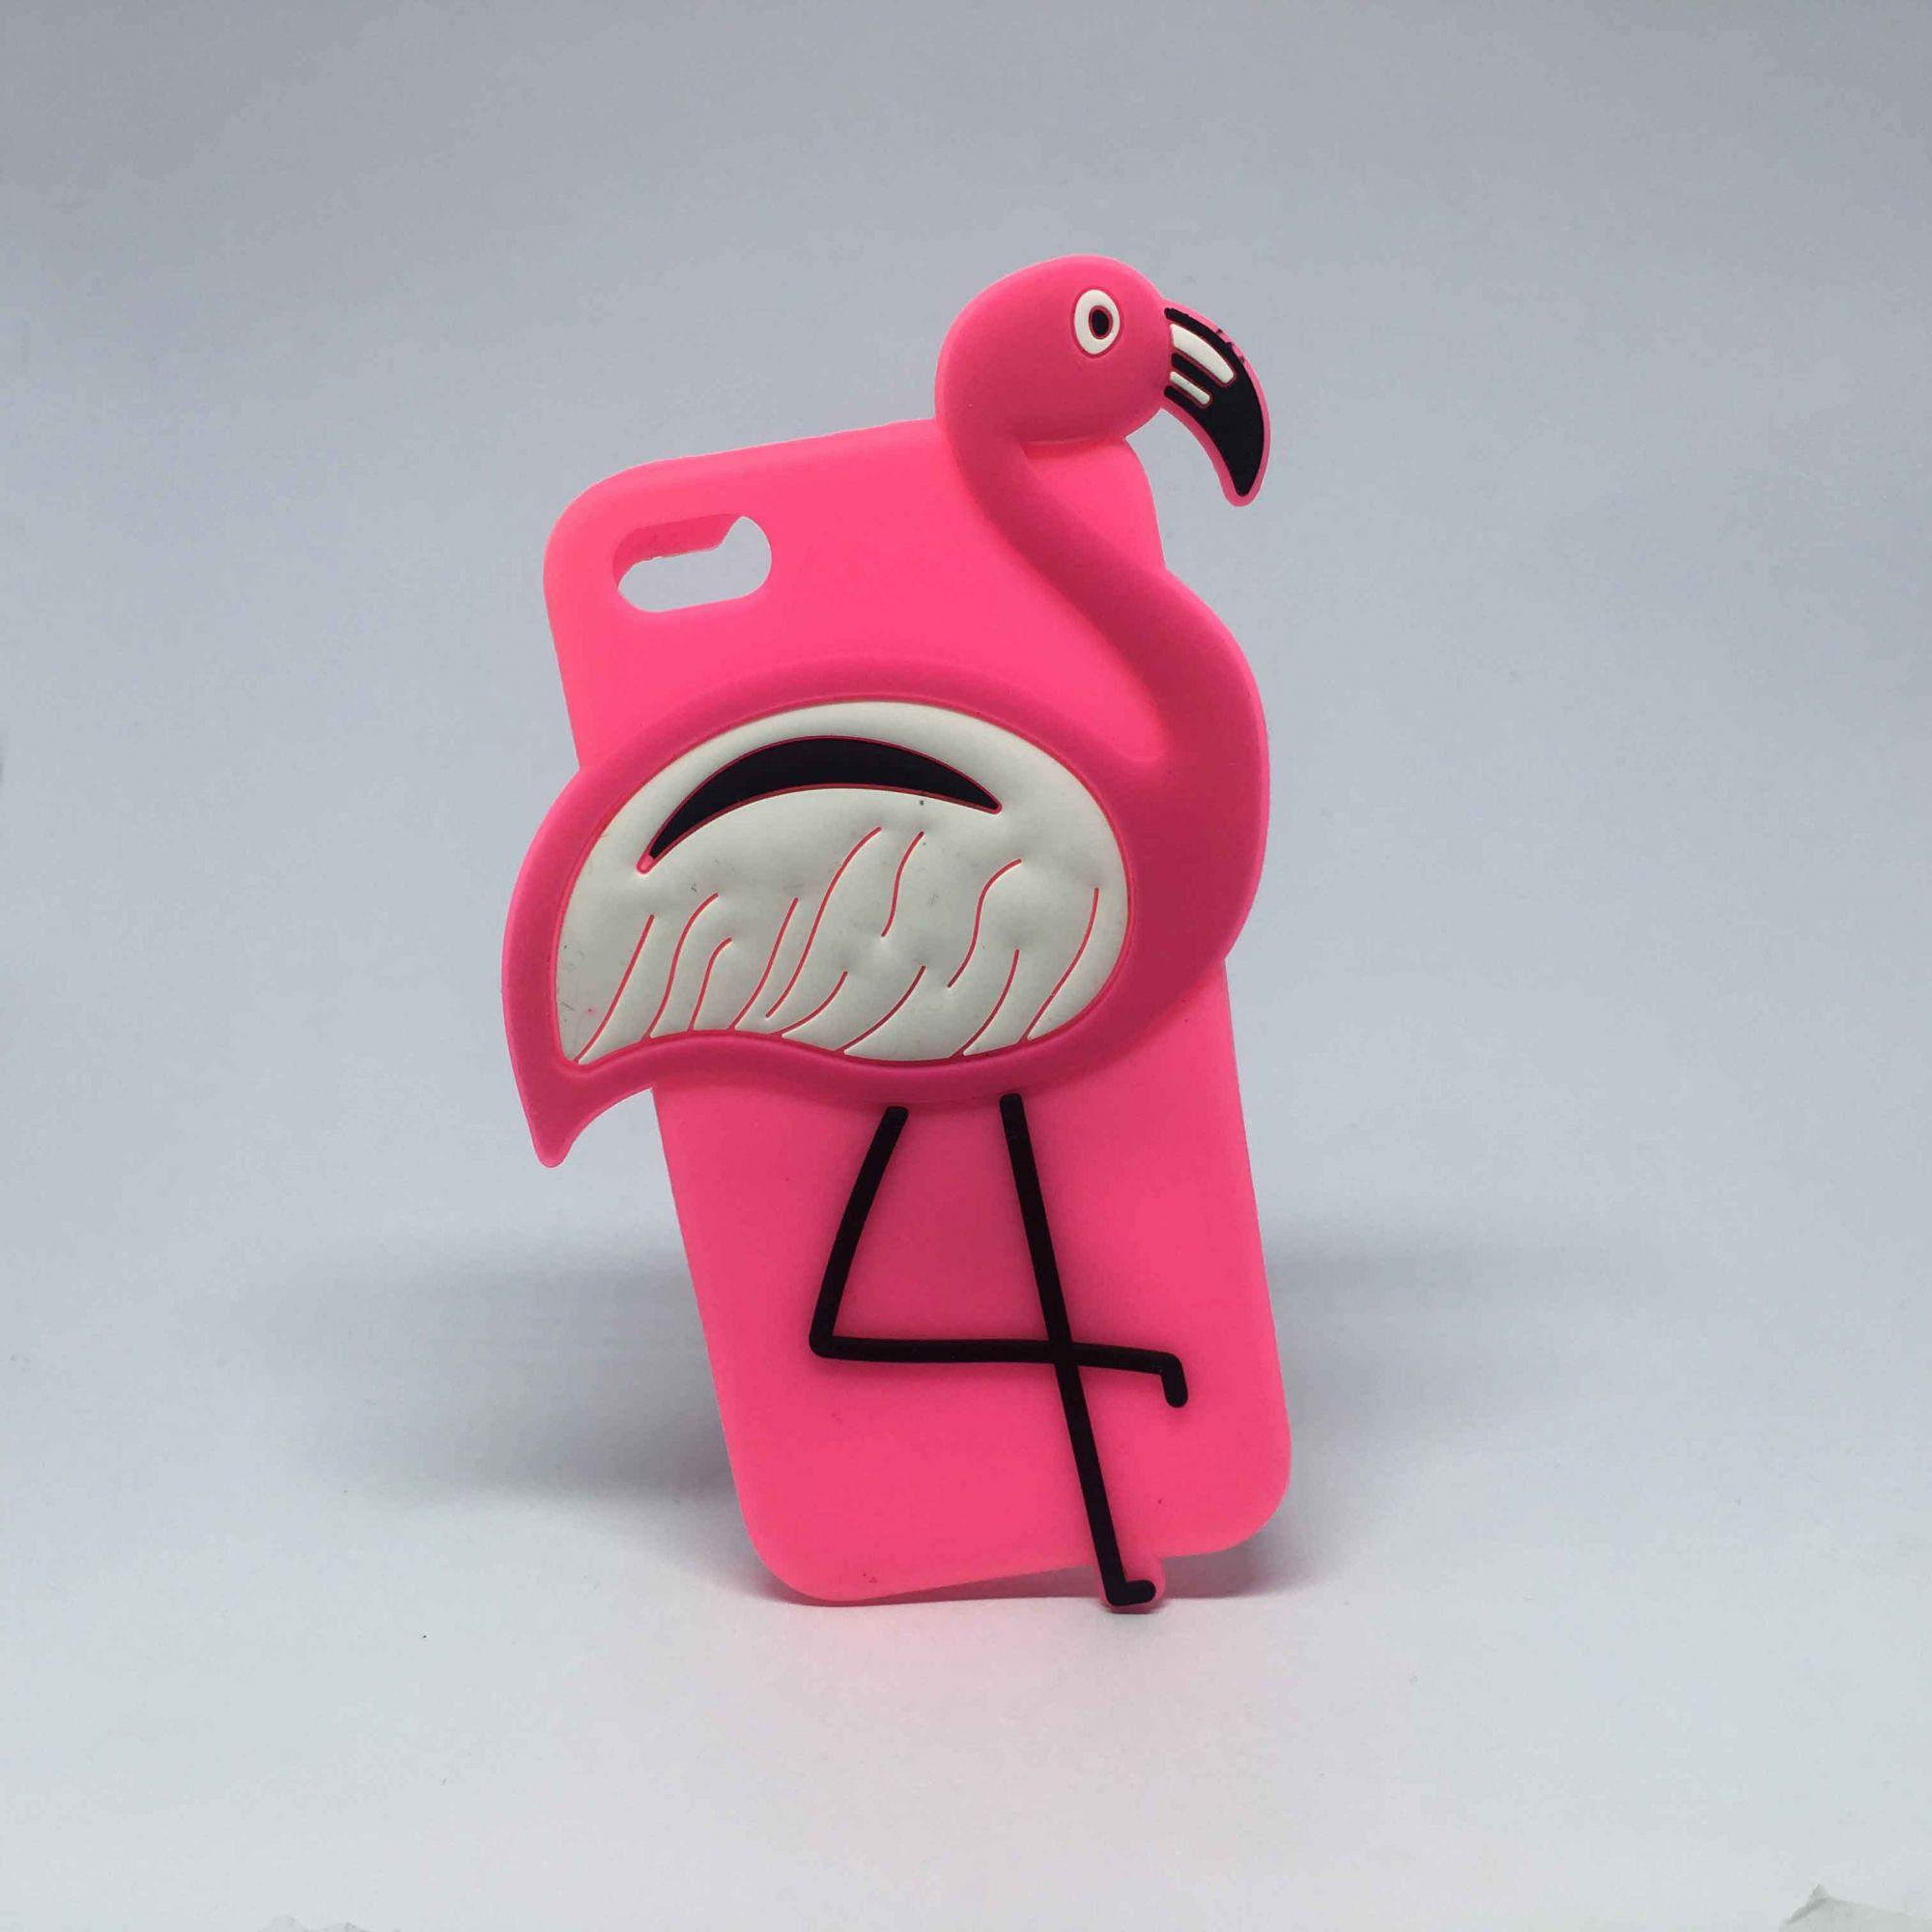 Capa Iphone 5s/SE Personagens - Flamingo